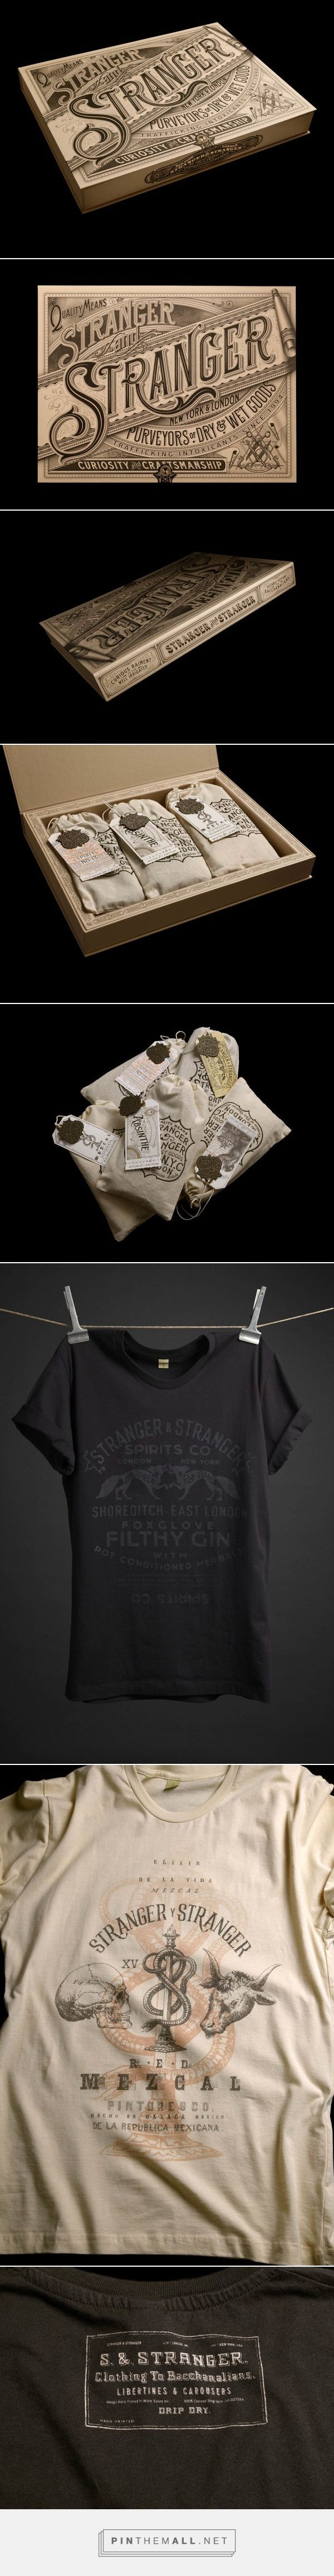 Vintage T-Shirt Packaging Design by Stranger & Stranger